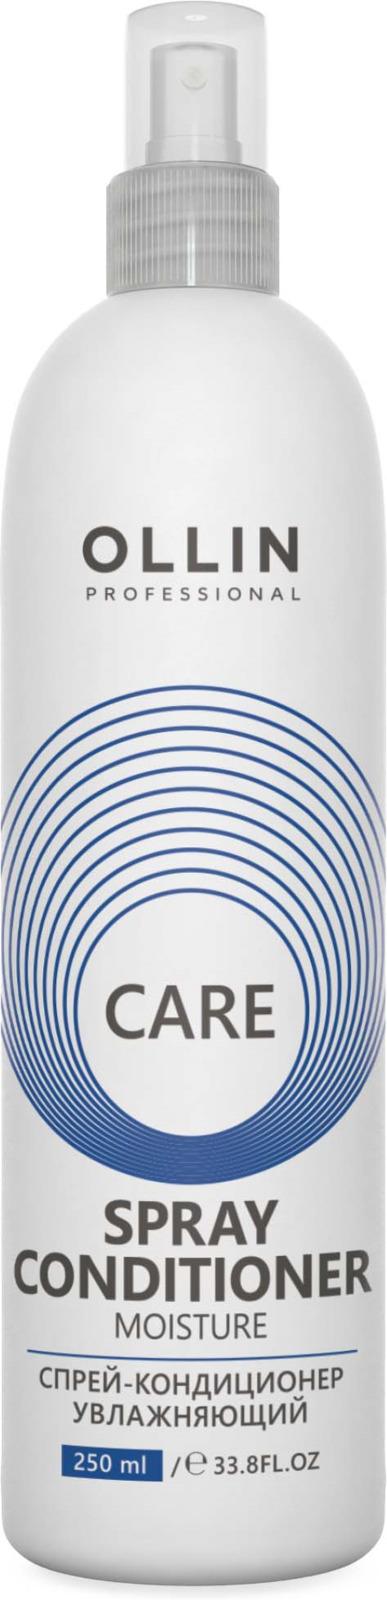 Ollin Спрей-кондиционер увлажняющий Care Moisture Spray Conditioner 250 мл